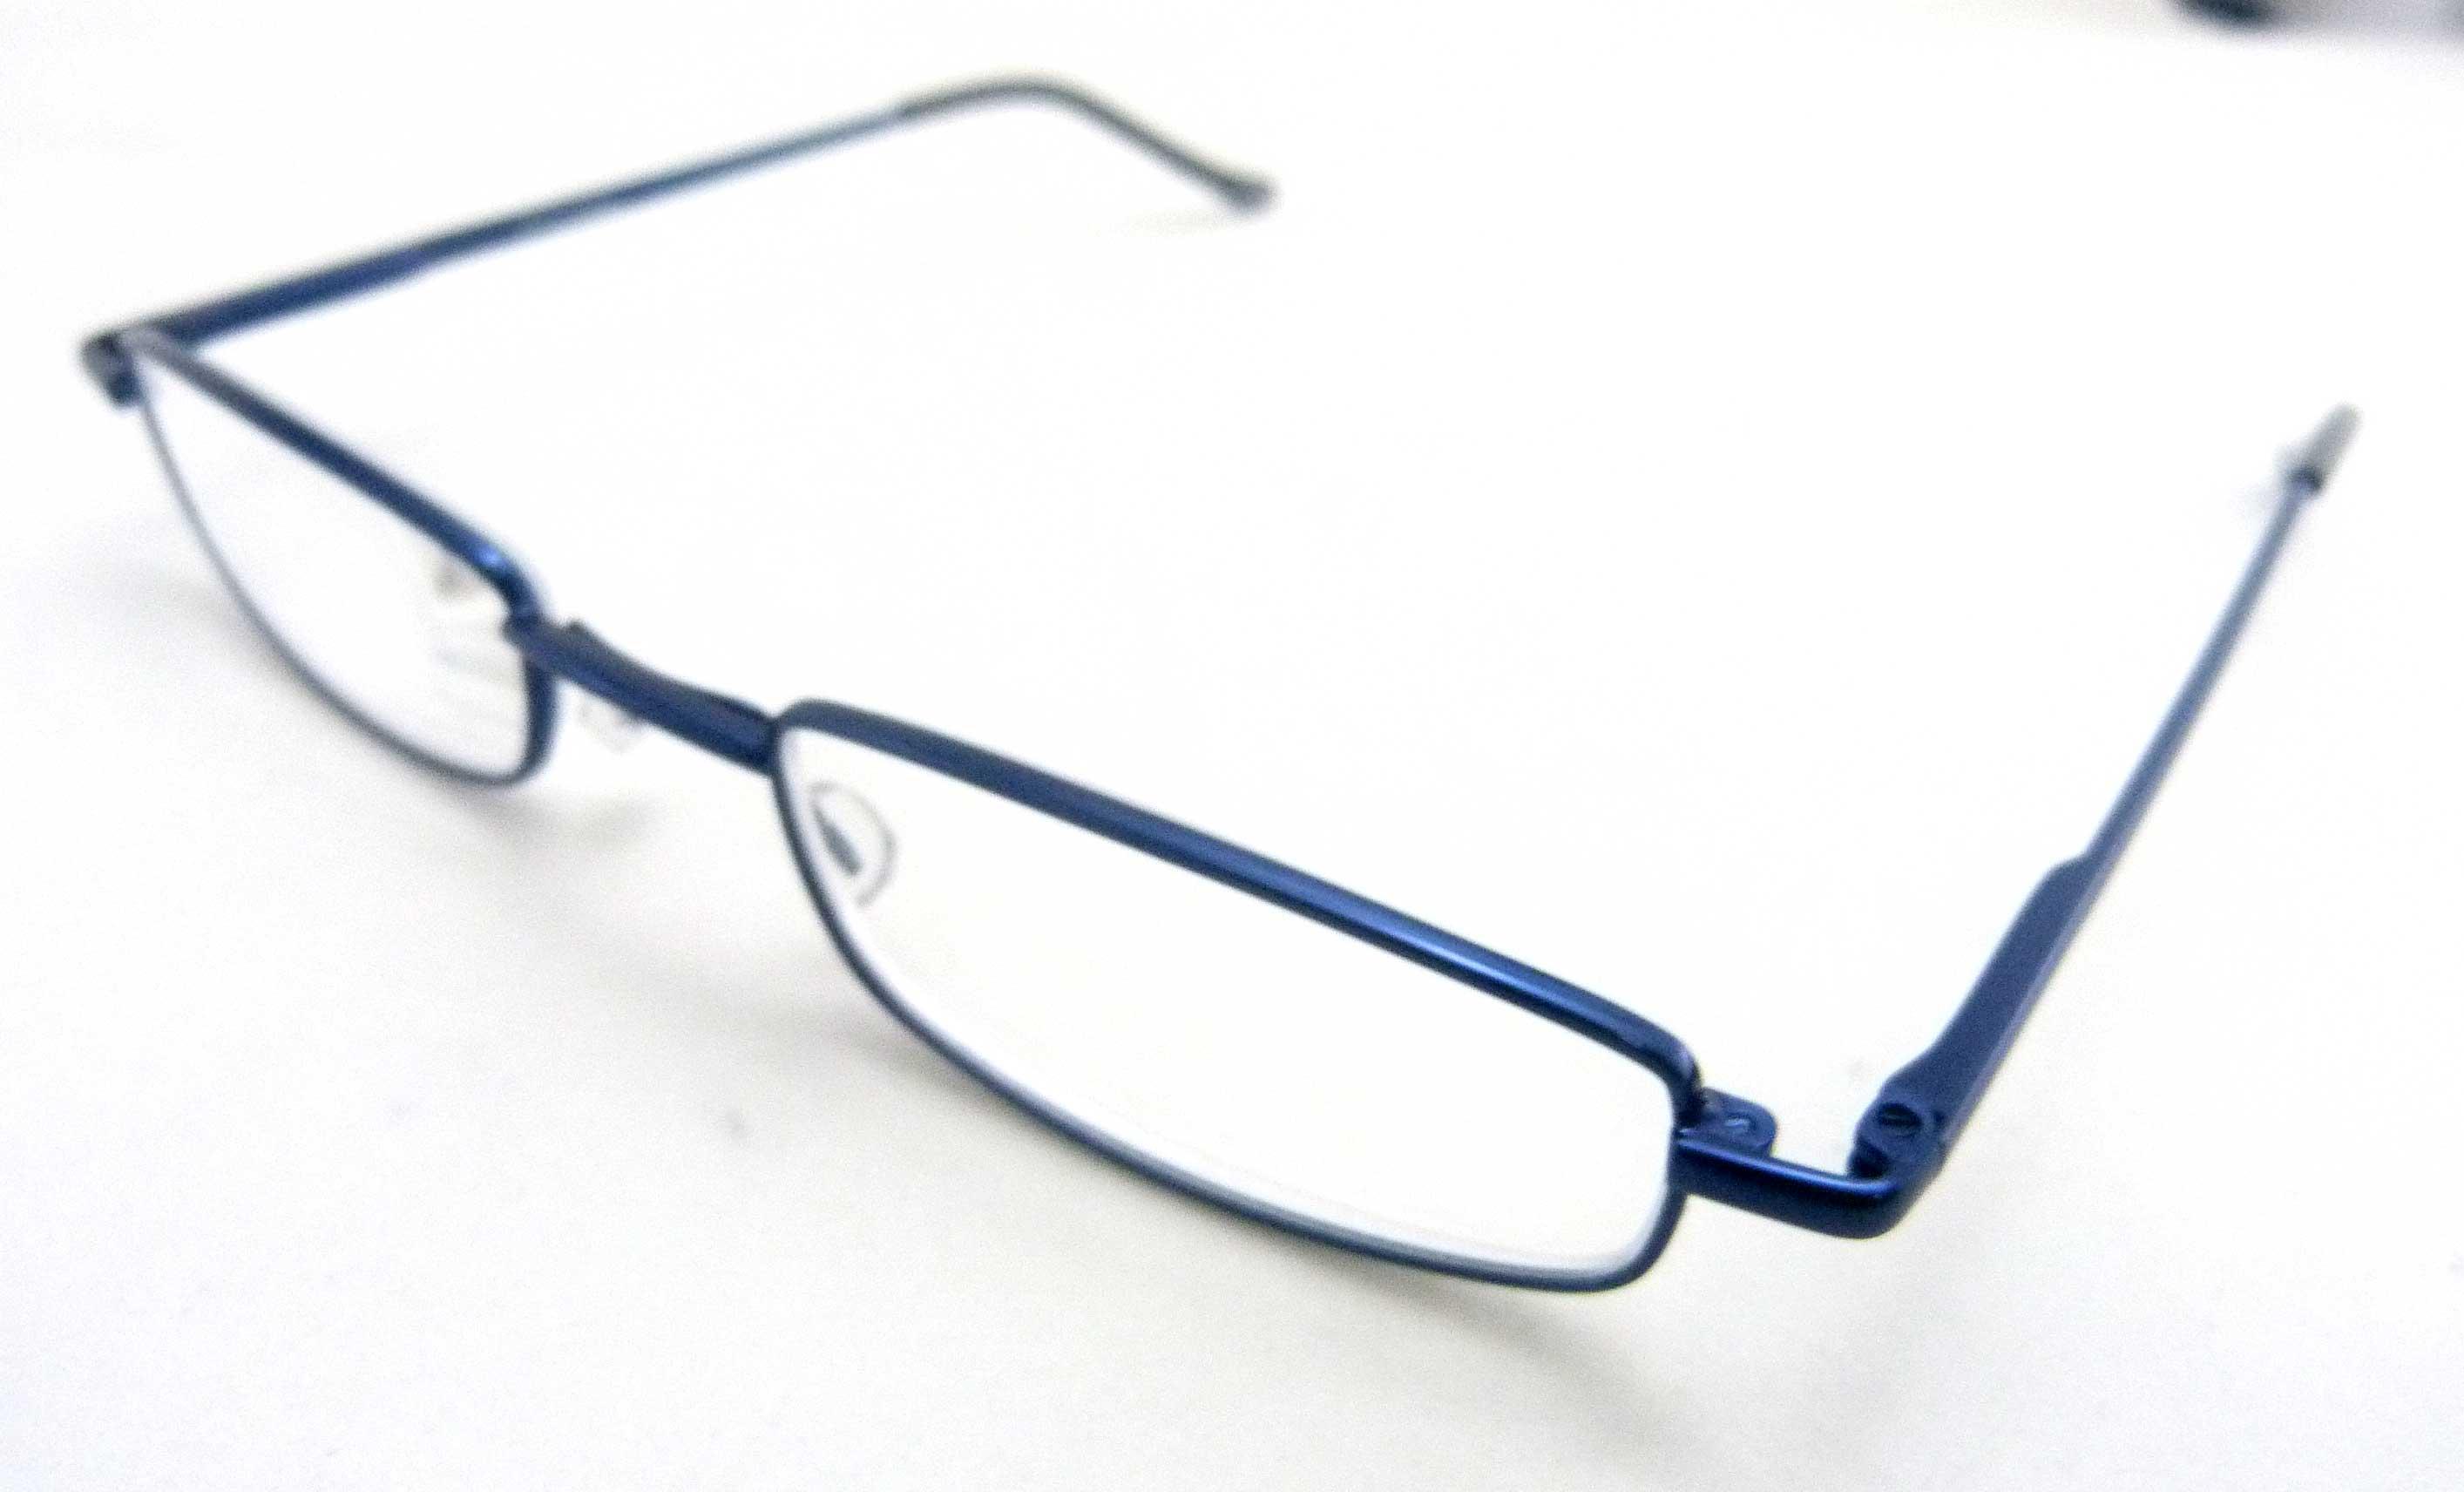 0263510 - Óculos Leitura Flex AT +1,00 Azul Mod 63510 FLAG 9  -Contém 1 Peça